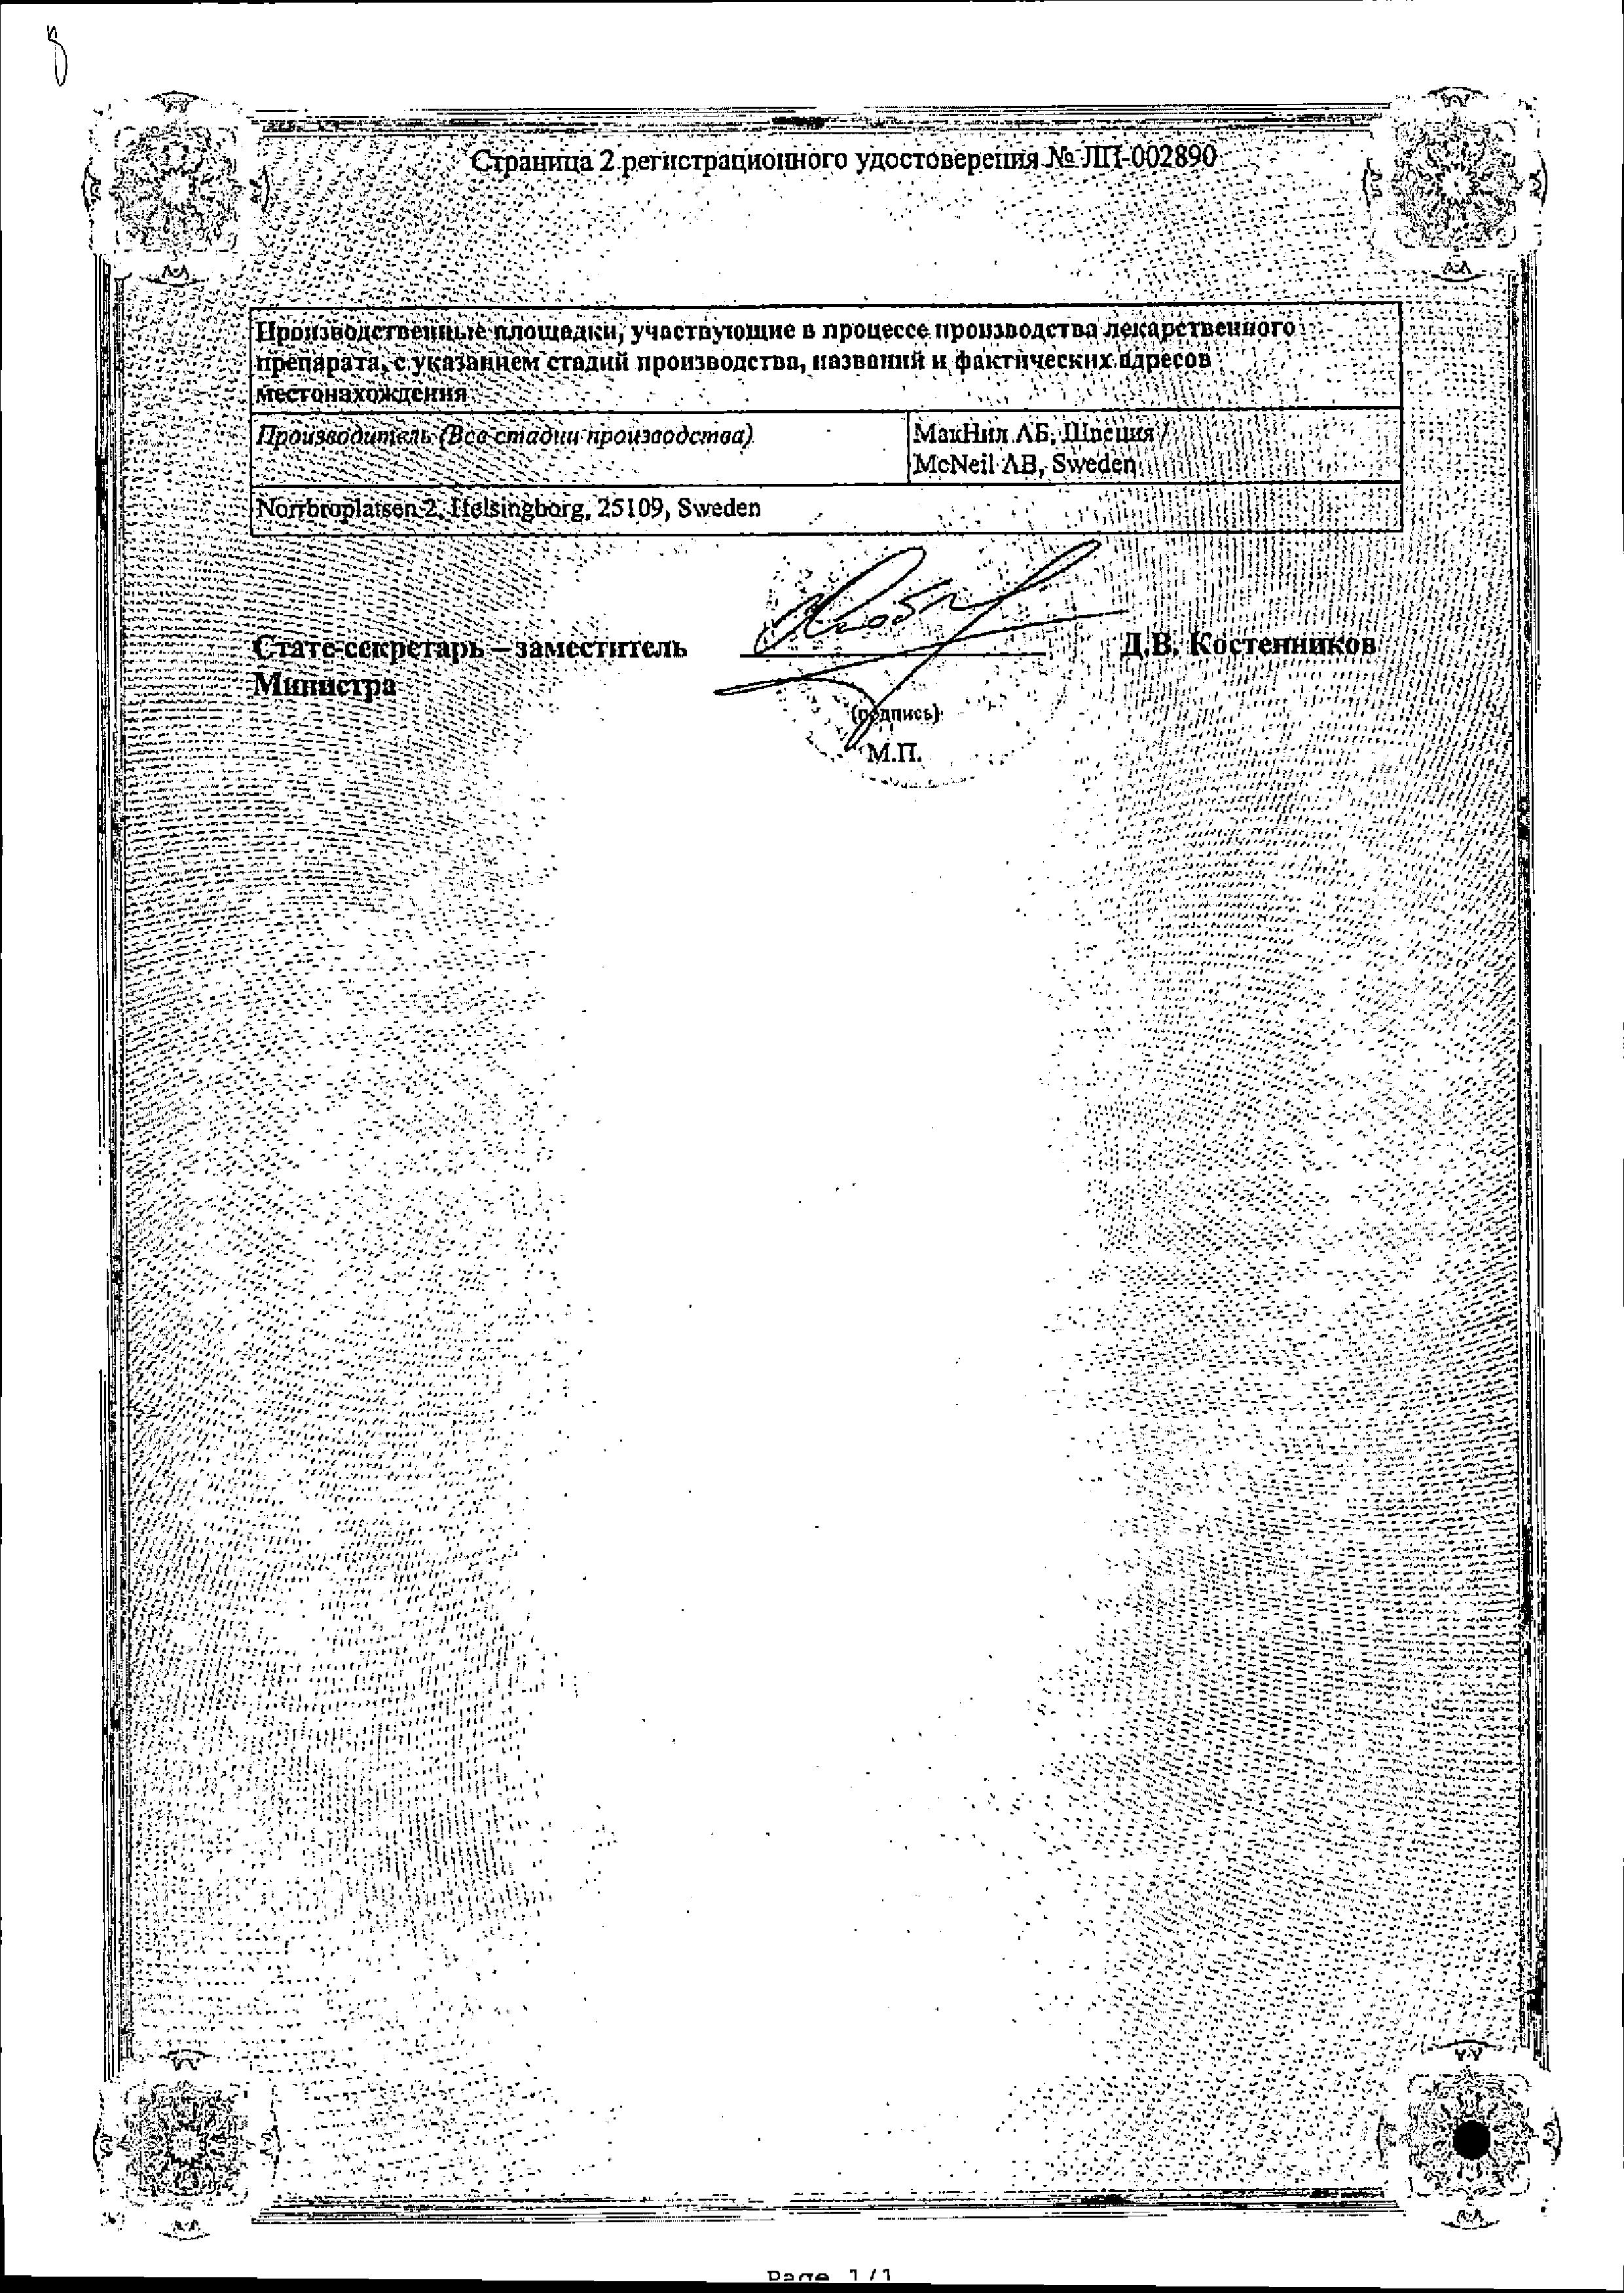 Никоретте сертификат